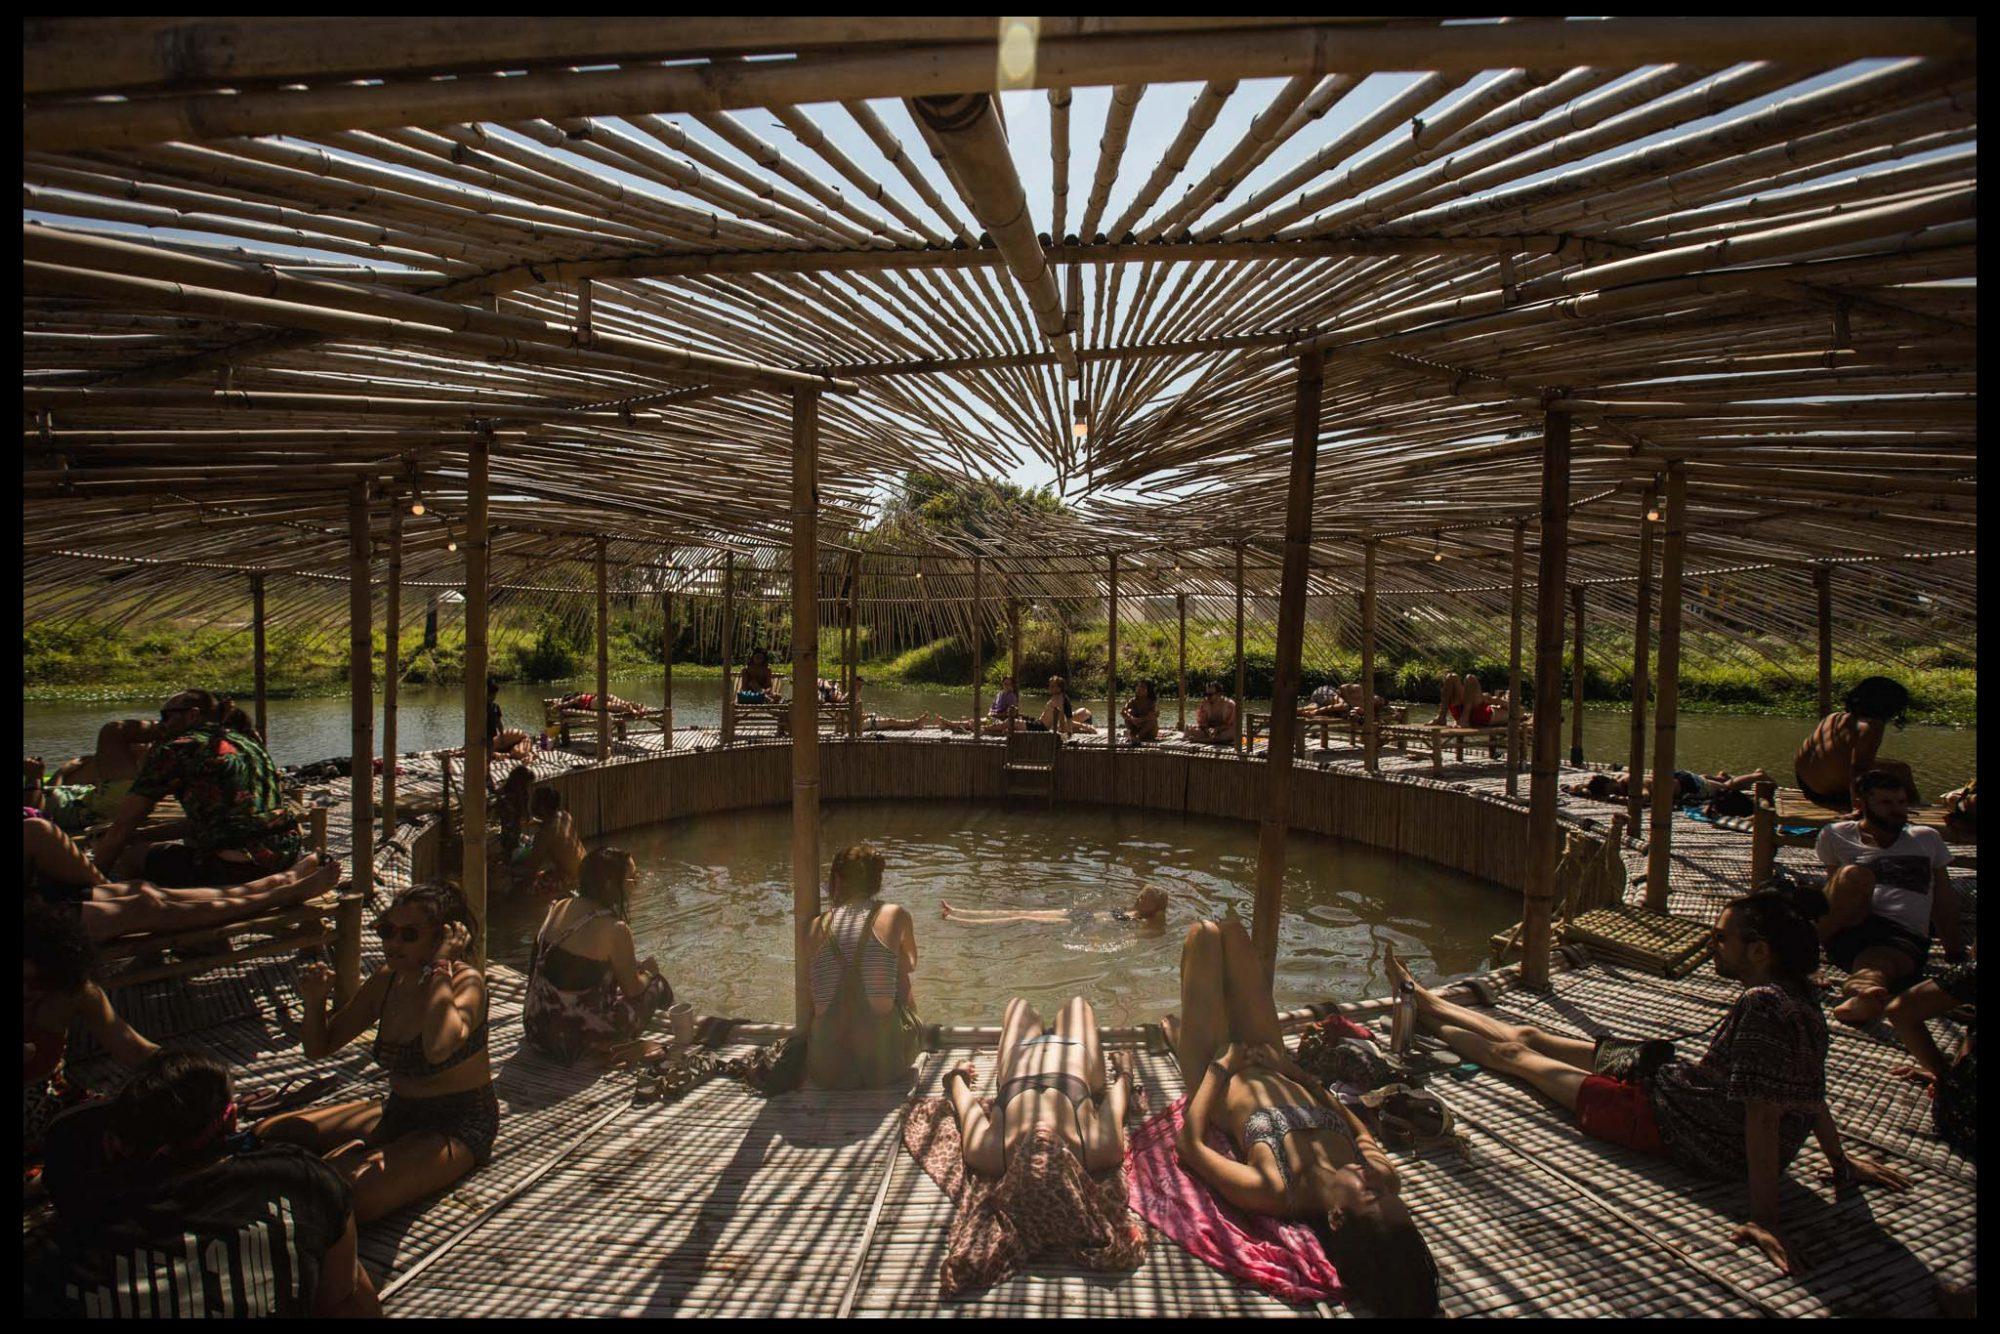 The Bath House at Wonderfruit